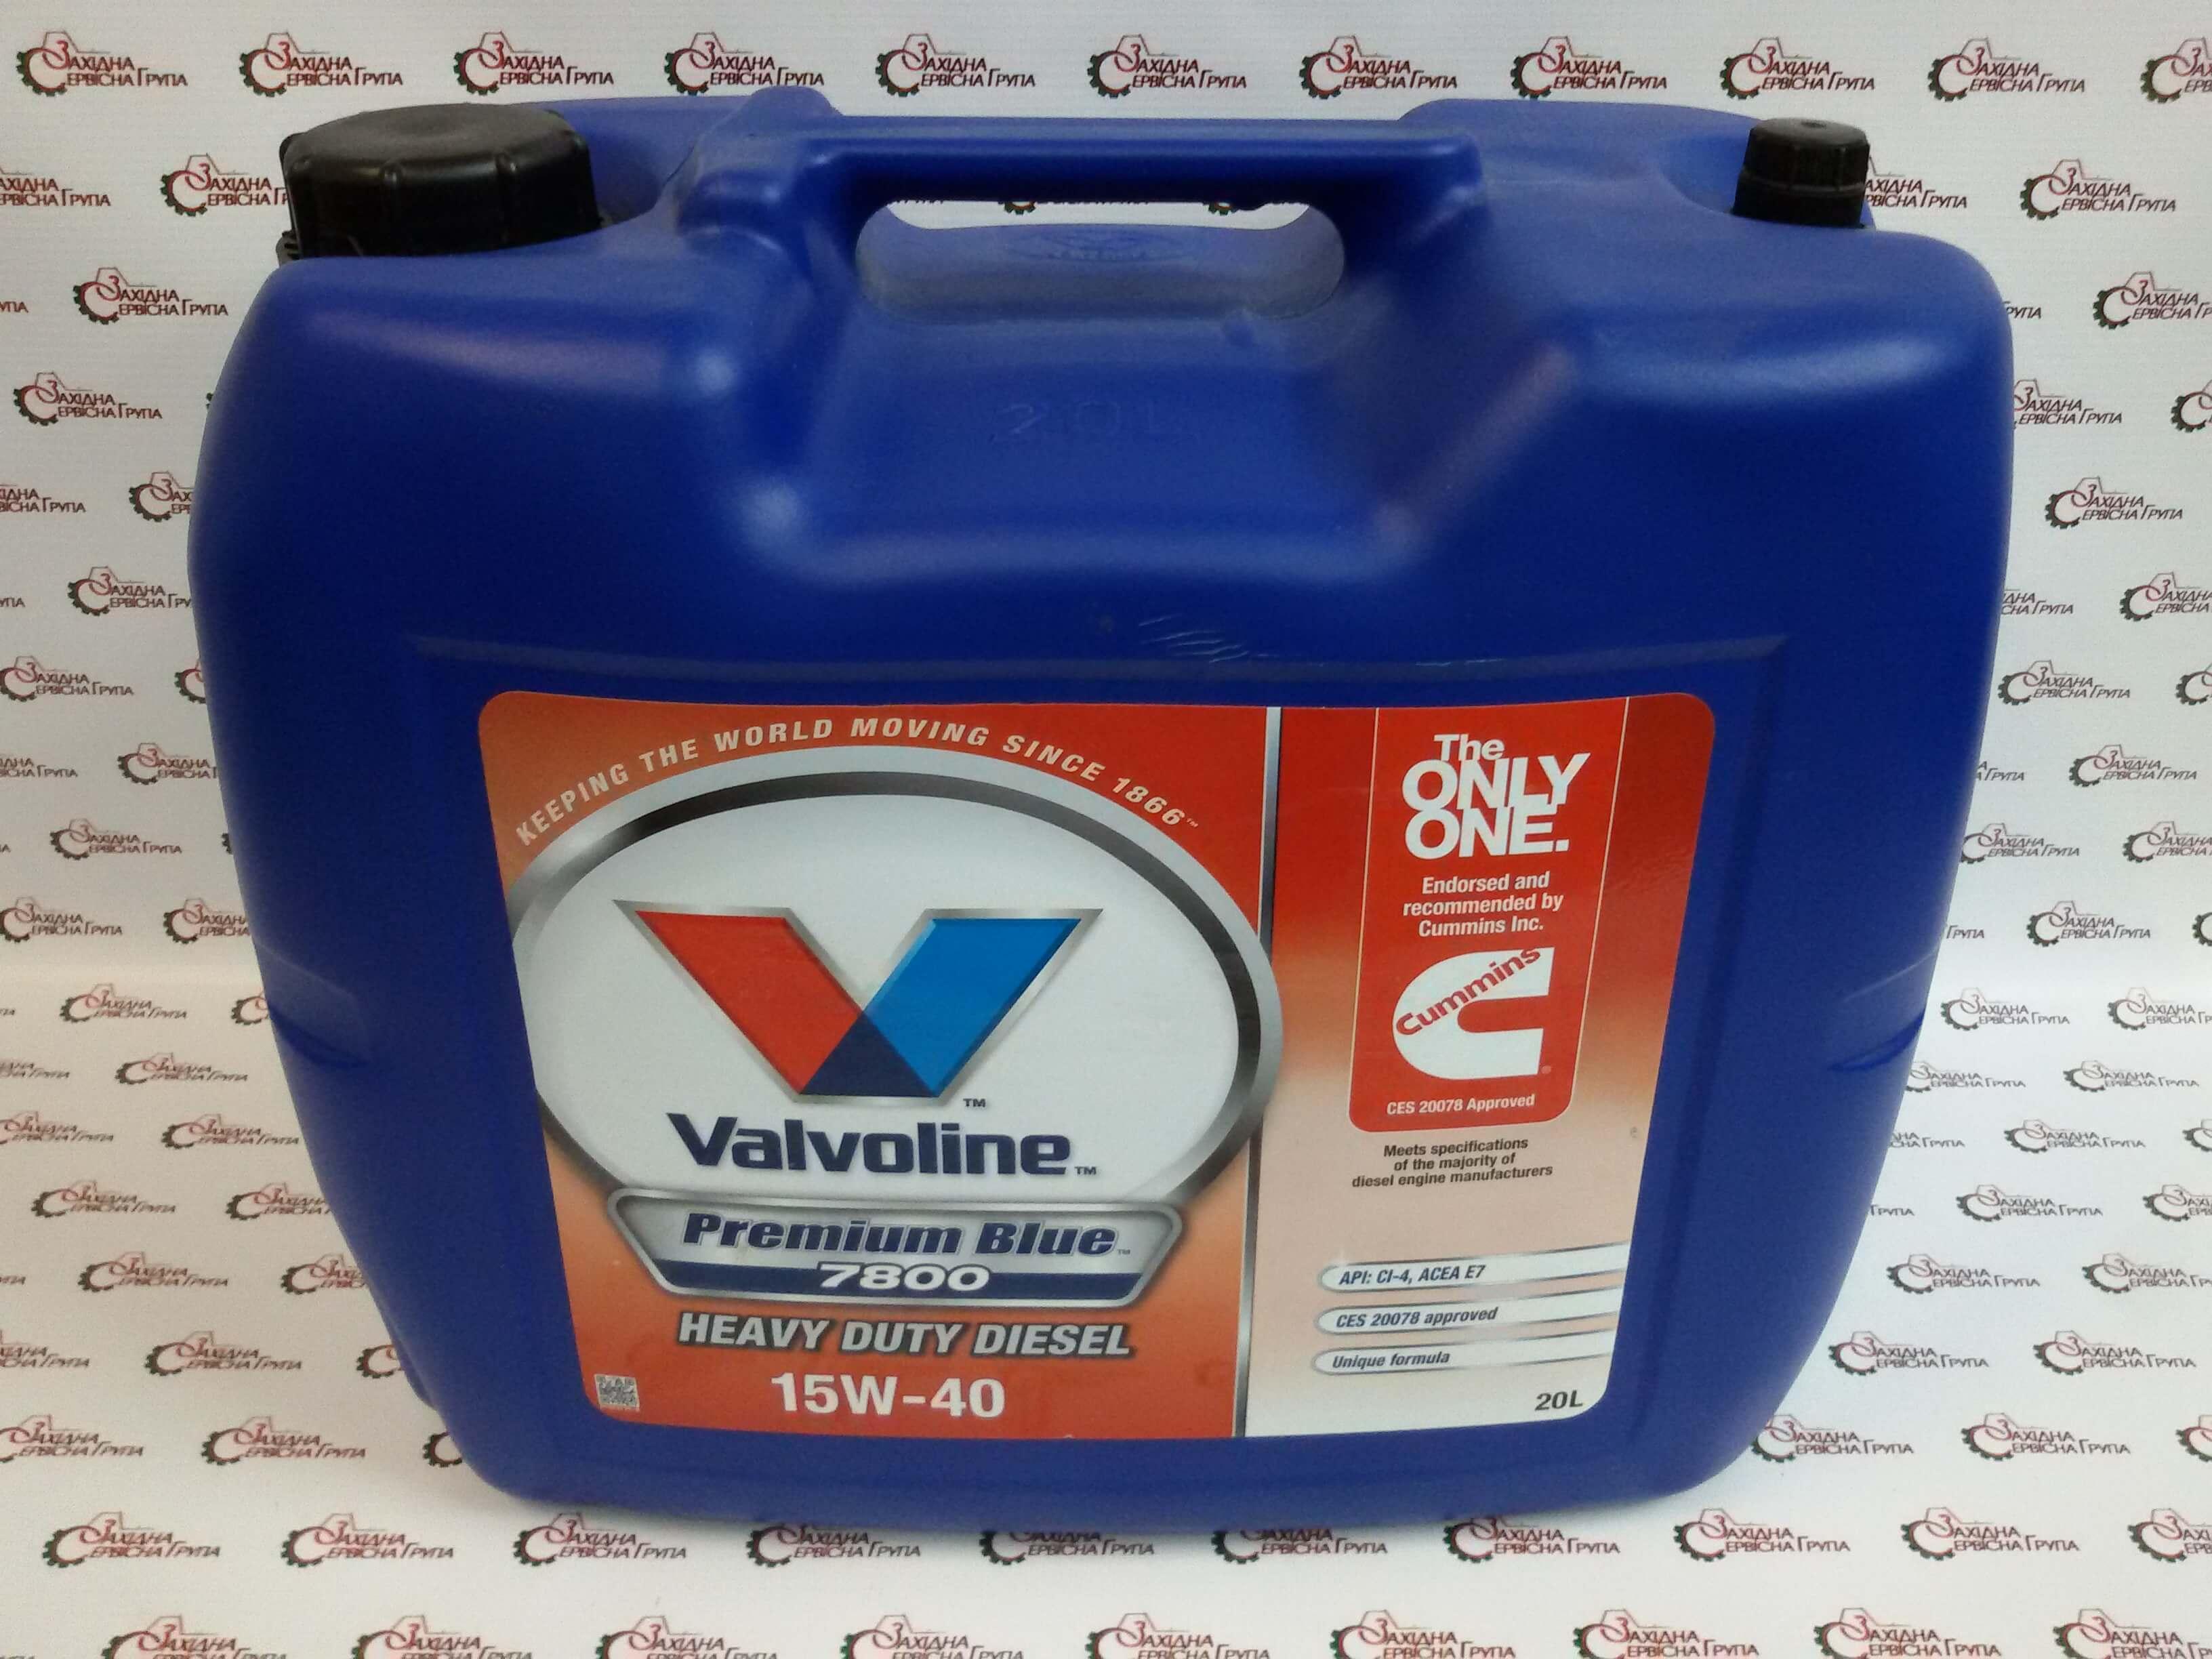 Масло моторне Valvoline Premium Blue 7800 15W-40. Для дизельних двигунів.